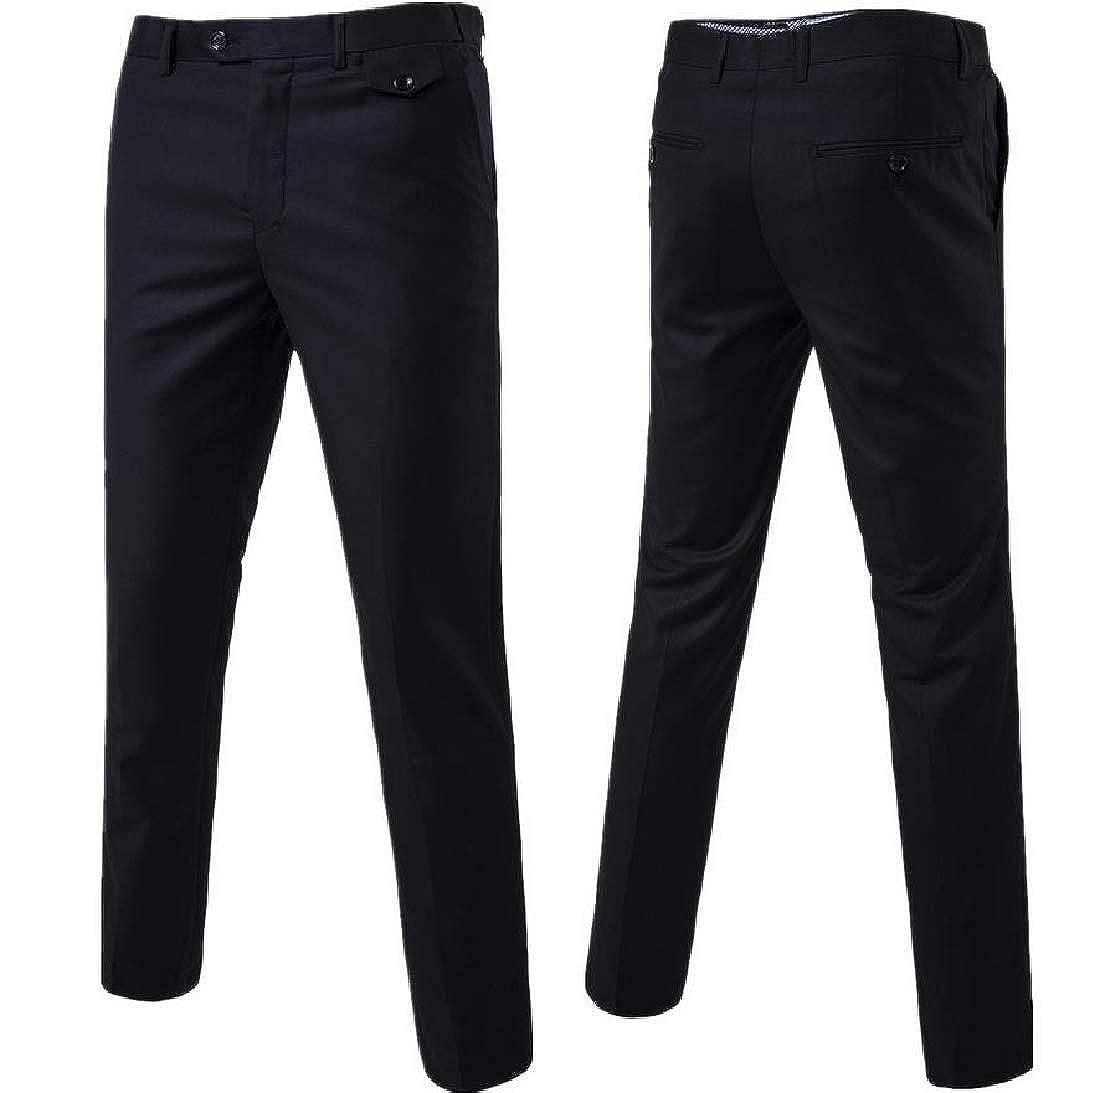 Coolred-Men Gentleman Classic Premium Fit Casual Loose Plain-Front Pant